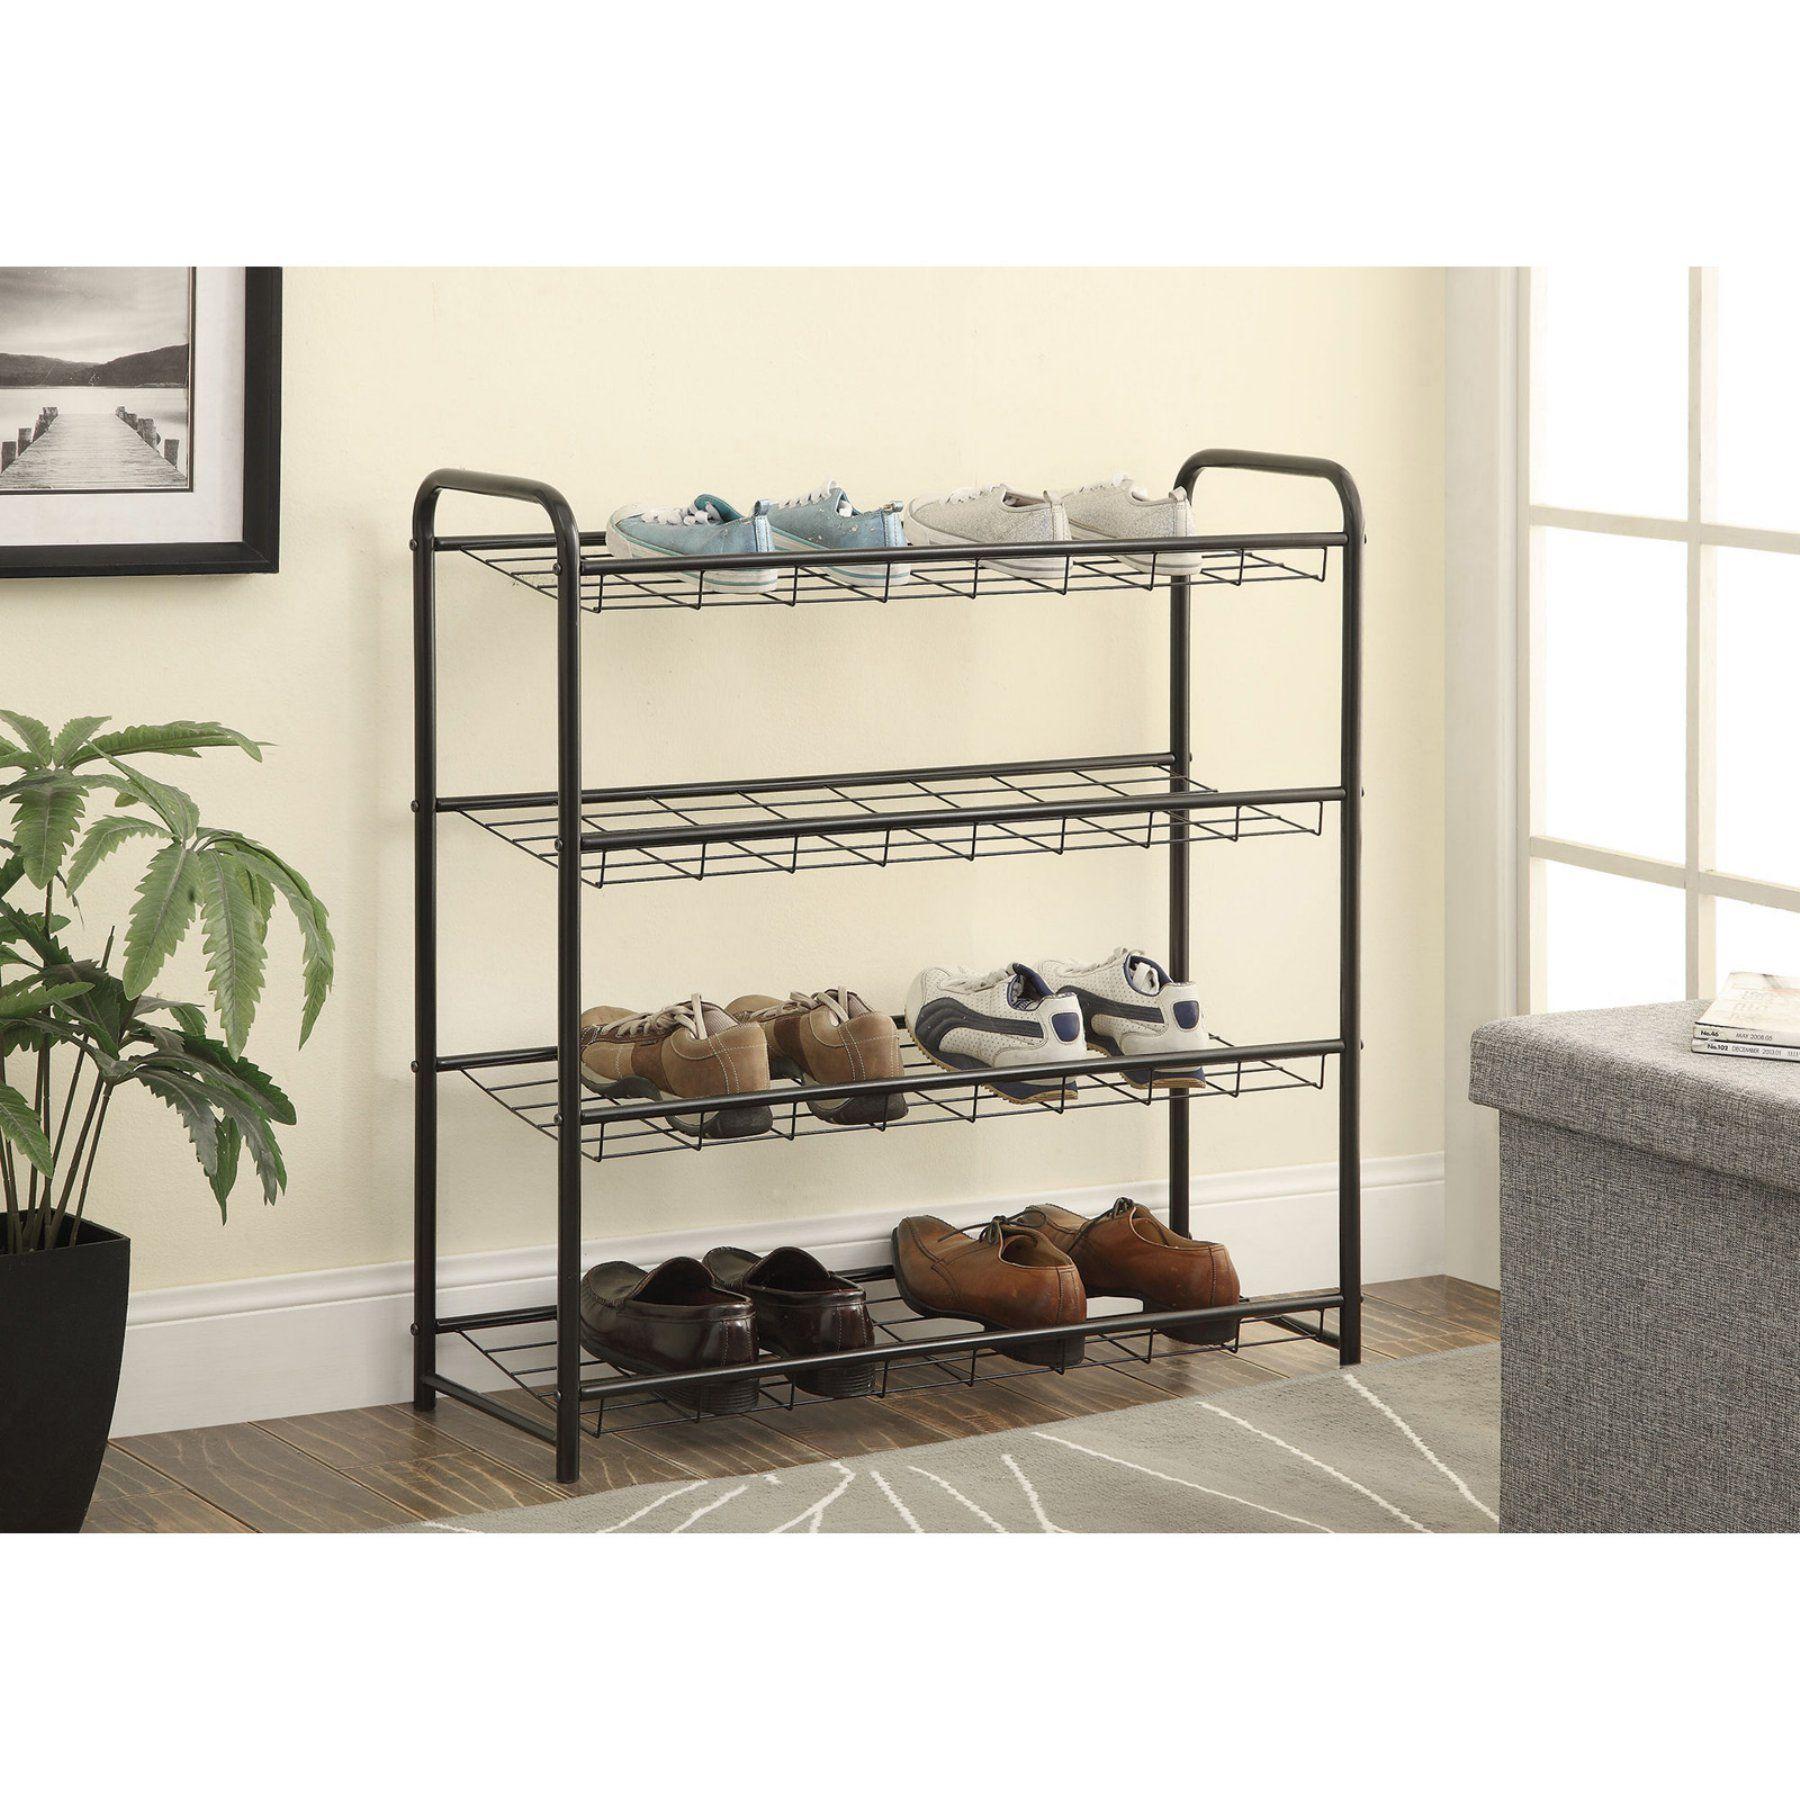 Hallway storage rack  Coaster Furniture  Shelf Metal Shoe Rack  Black    Shoe